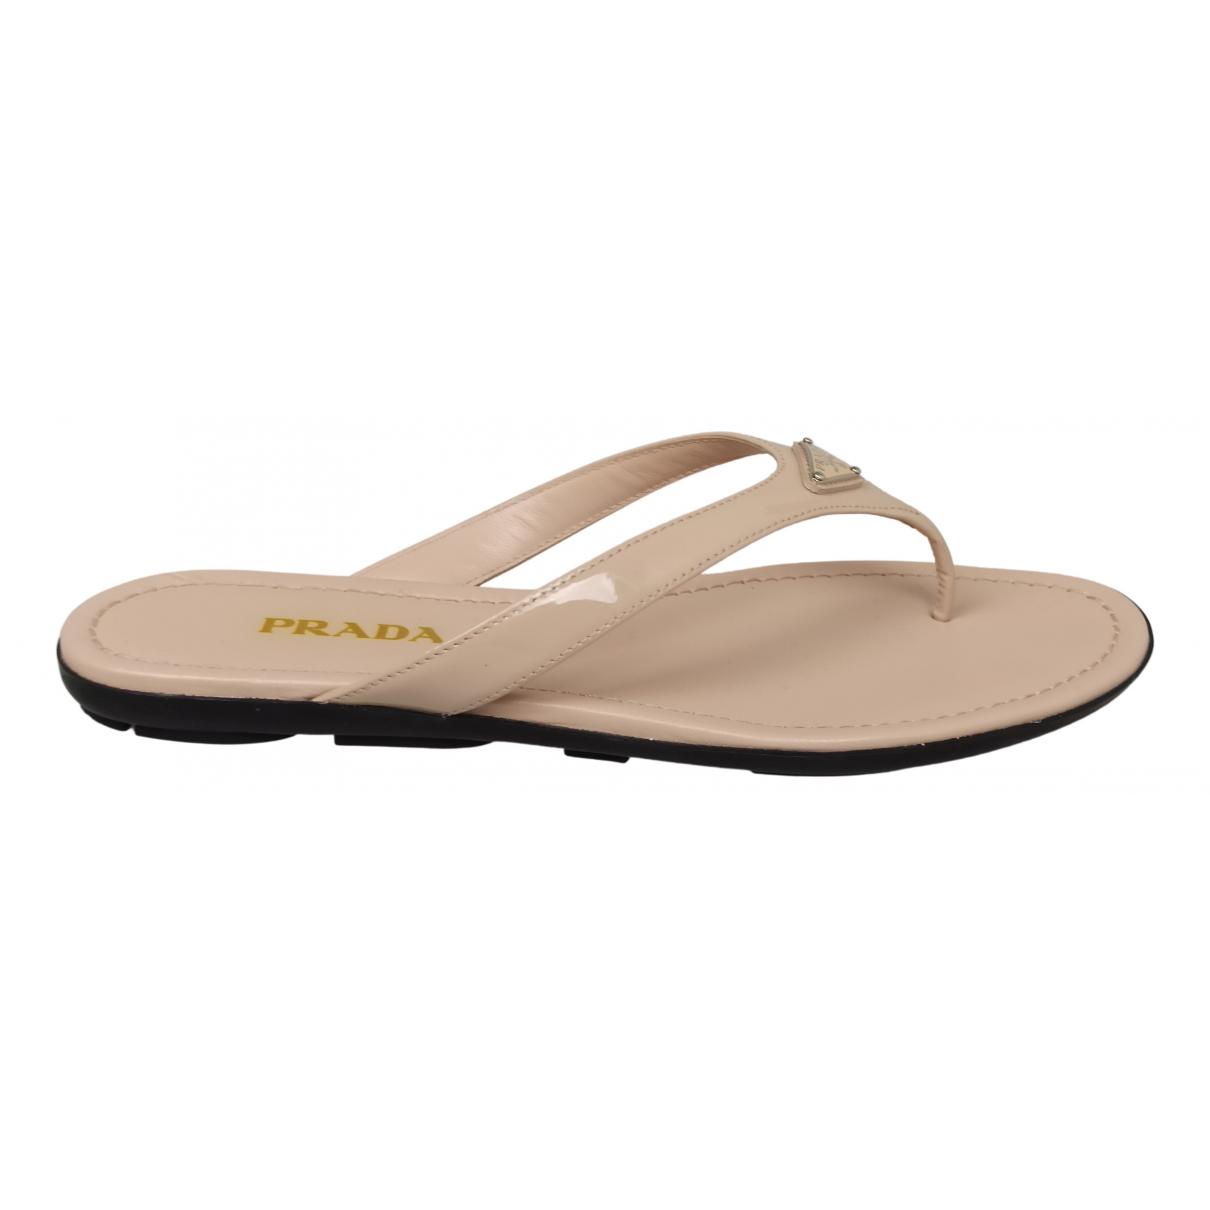 Prada N Pink Patent leather Sandals for Women 40 EU